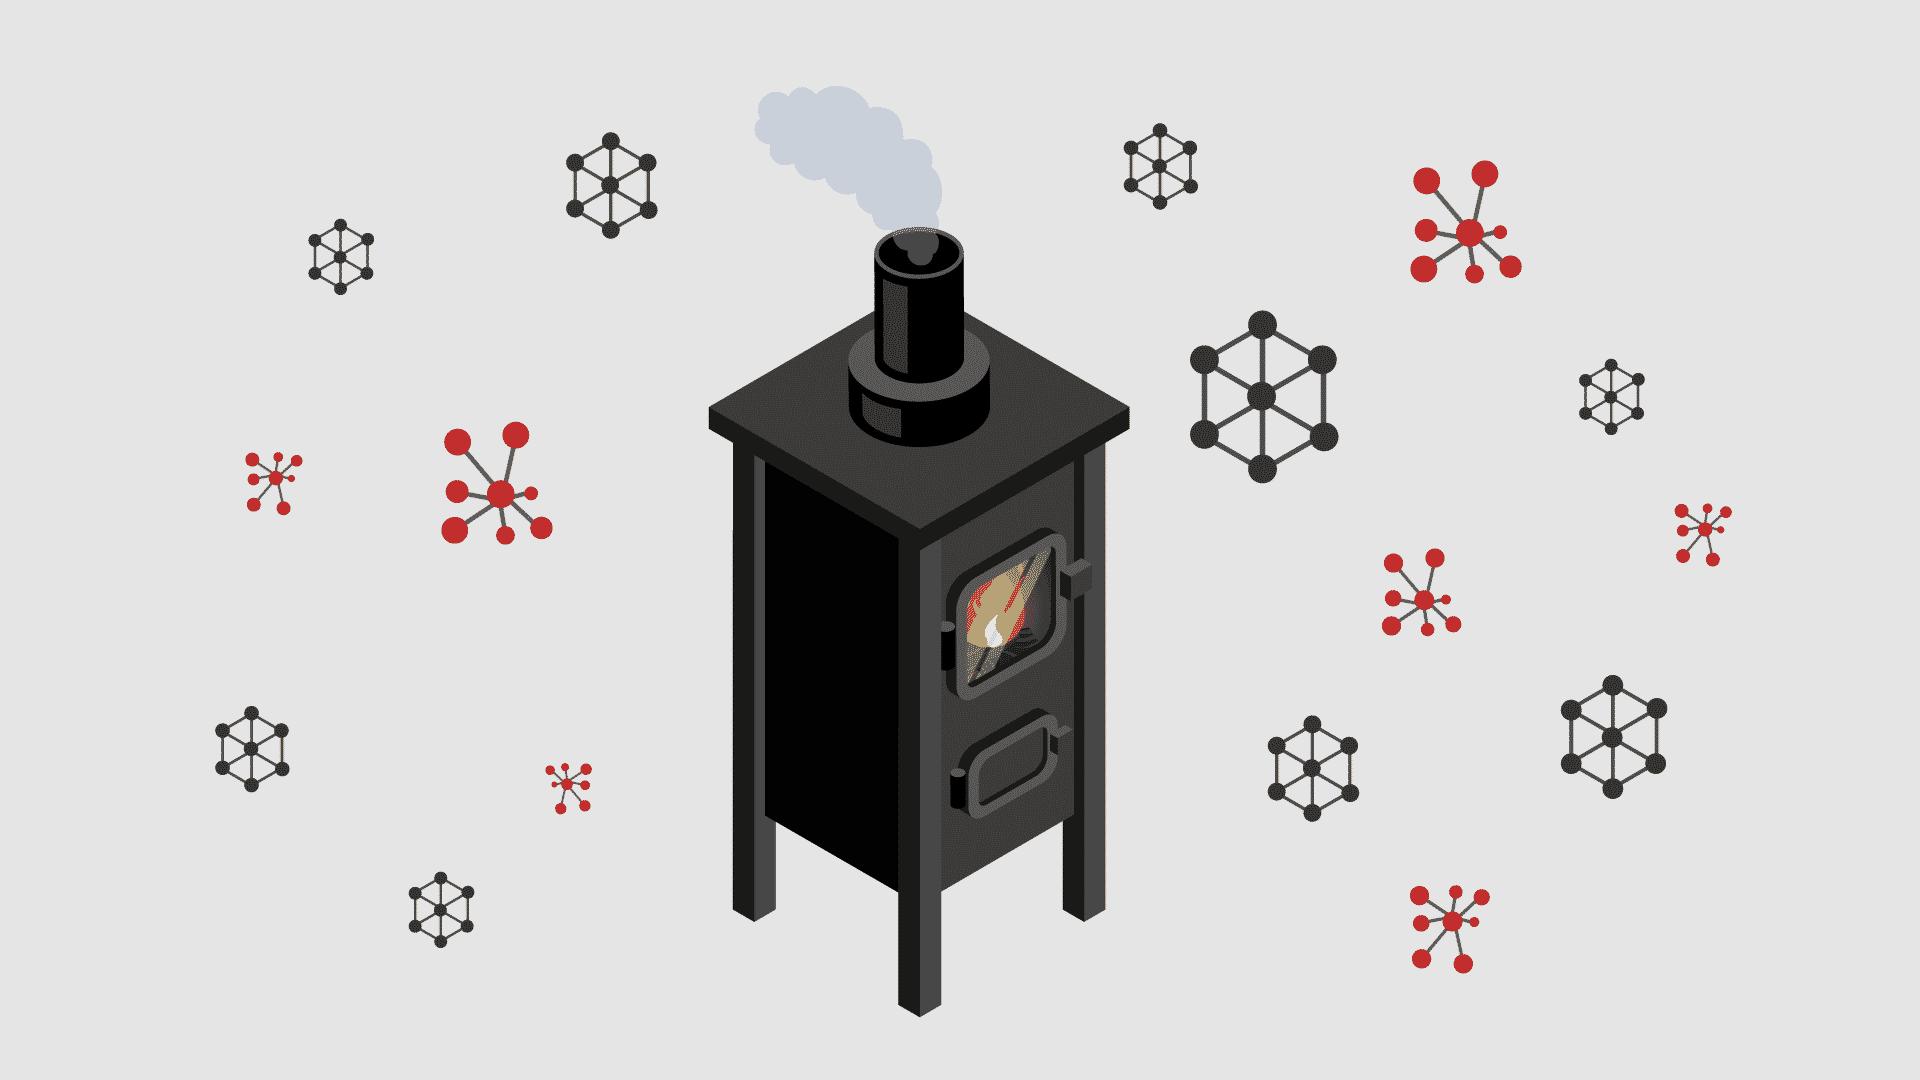 an illustration of a wood-burning stove emitting carbon monoxide